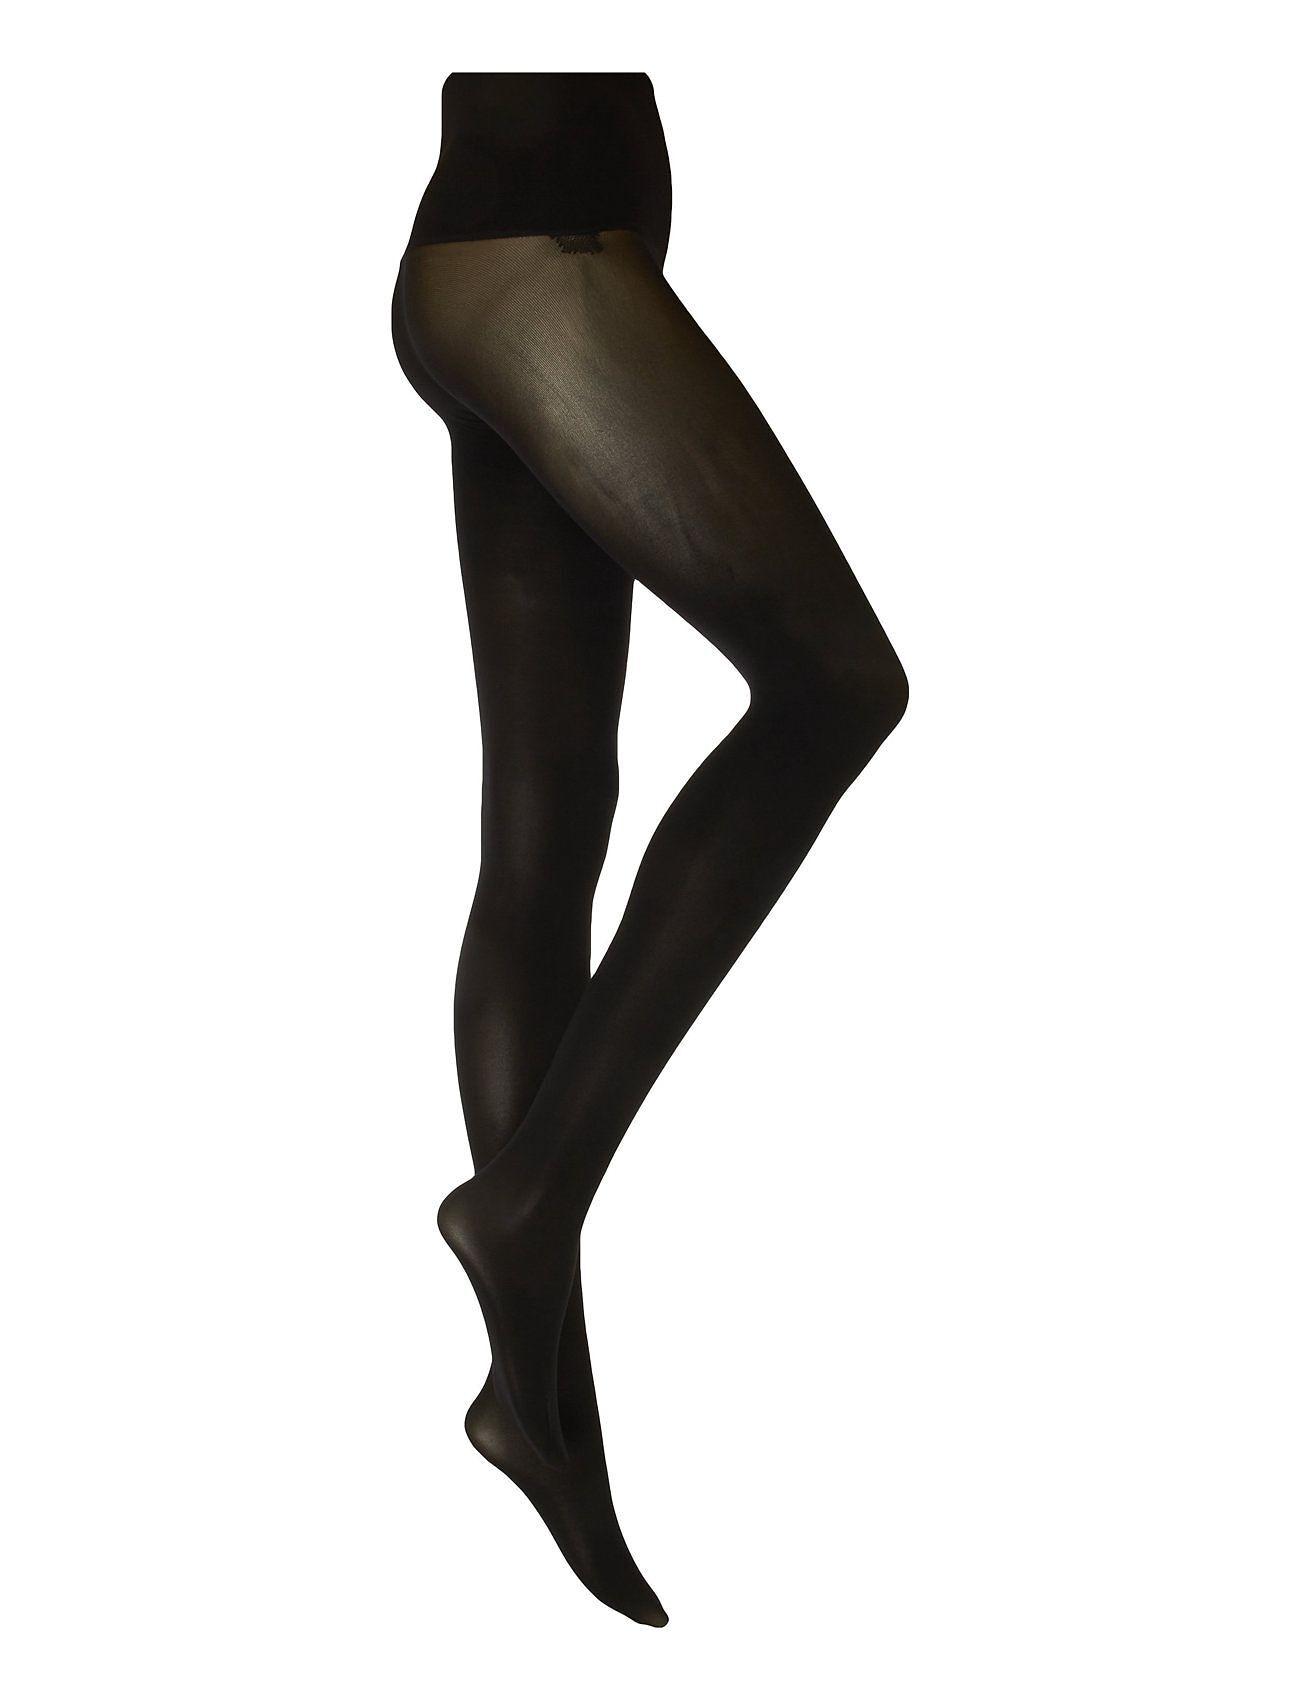 Swedish Stockings Hanna Premium Seamless Tights 40d Sukkahousut Musta Swedish Stockings